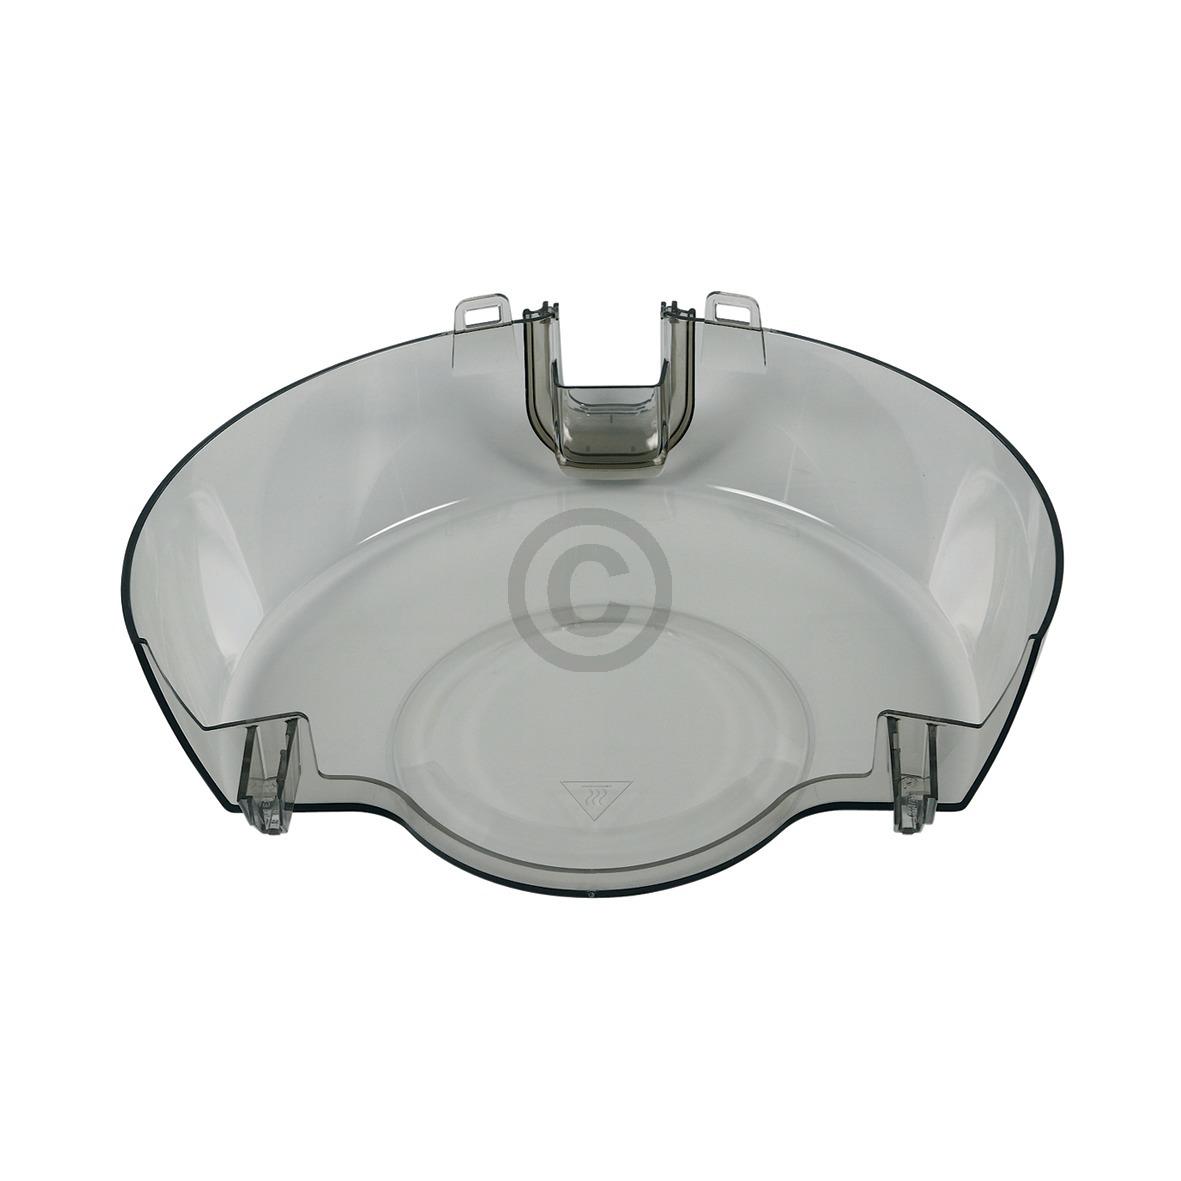 Deckel für Heissluft-Fritteuse Tefal ActiFry SS-992242 Krups Moulinex Rowenta Te